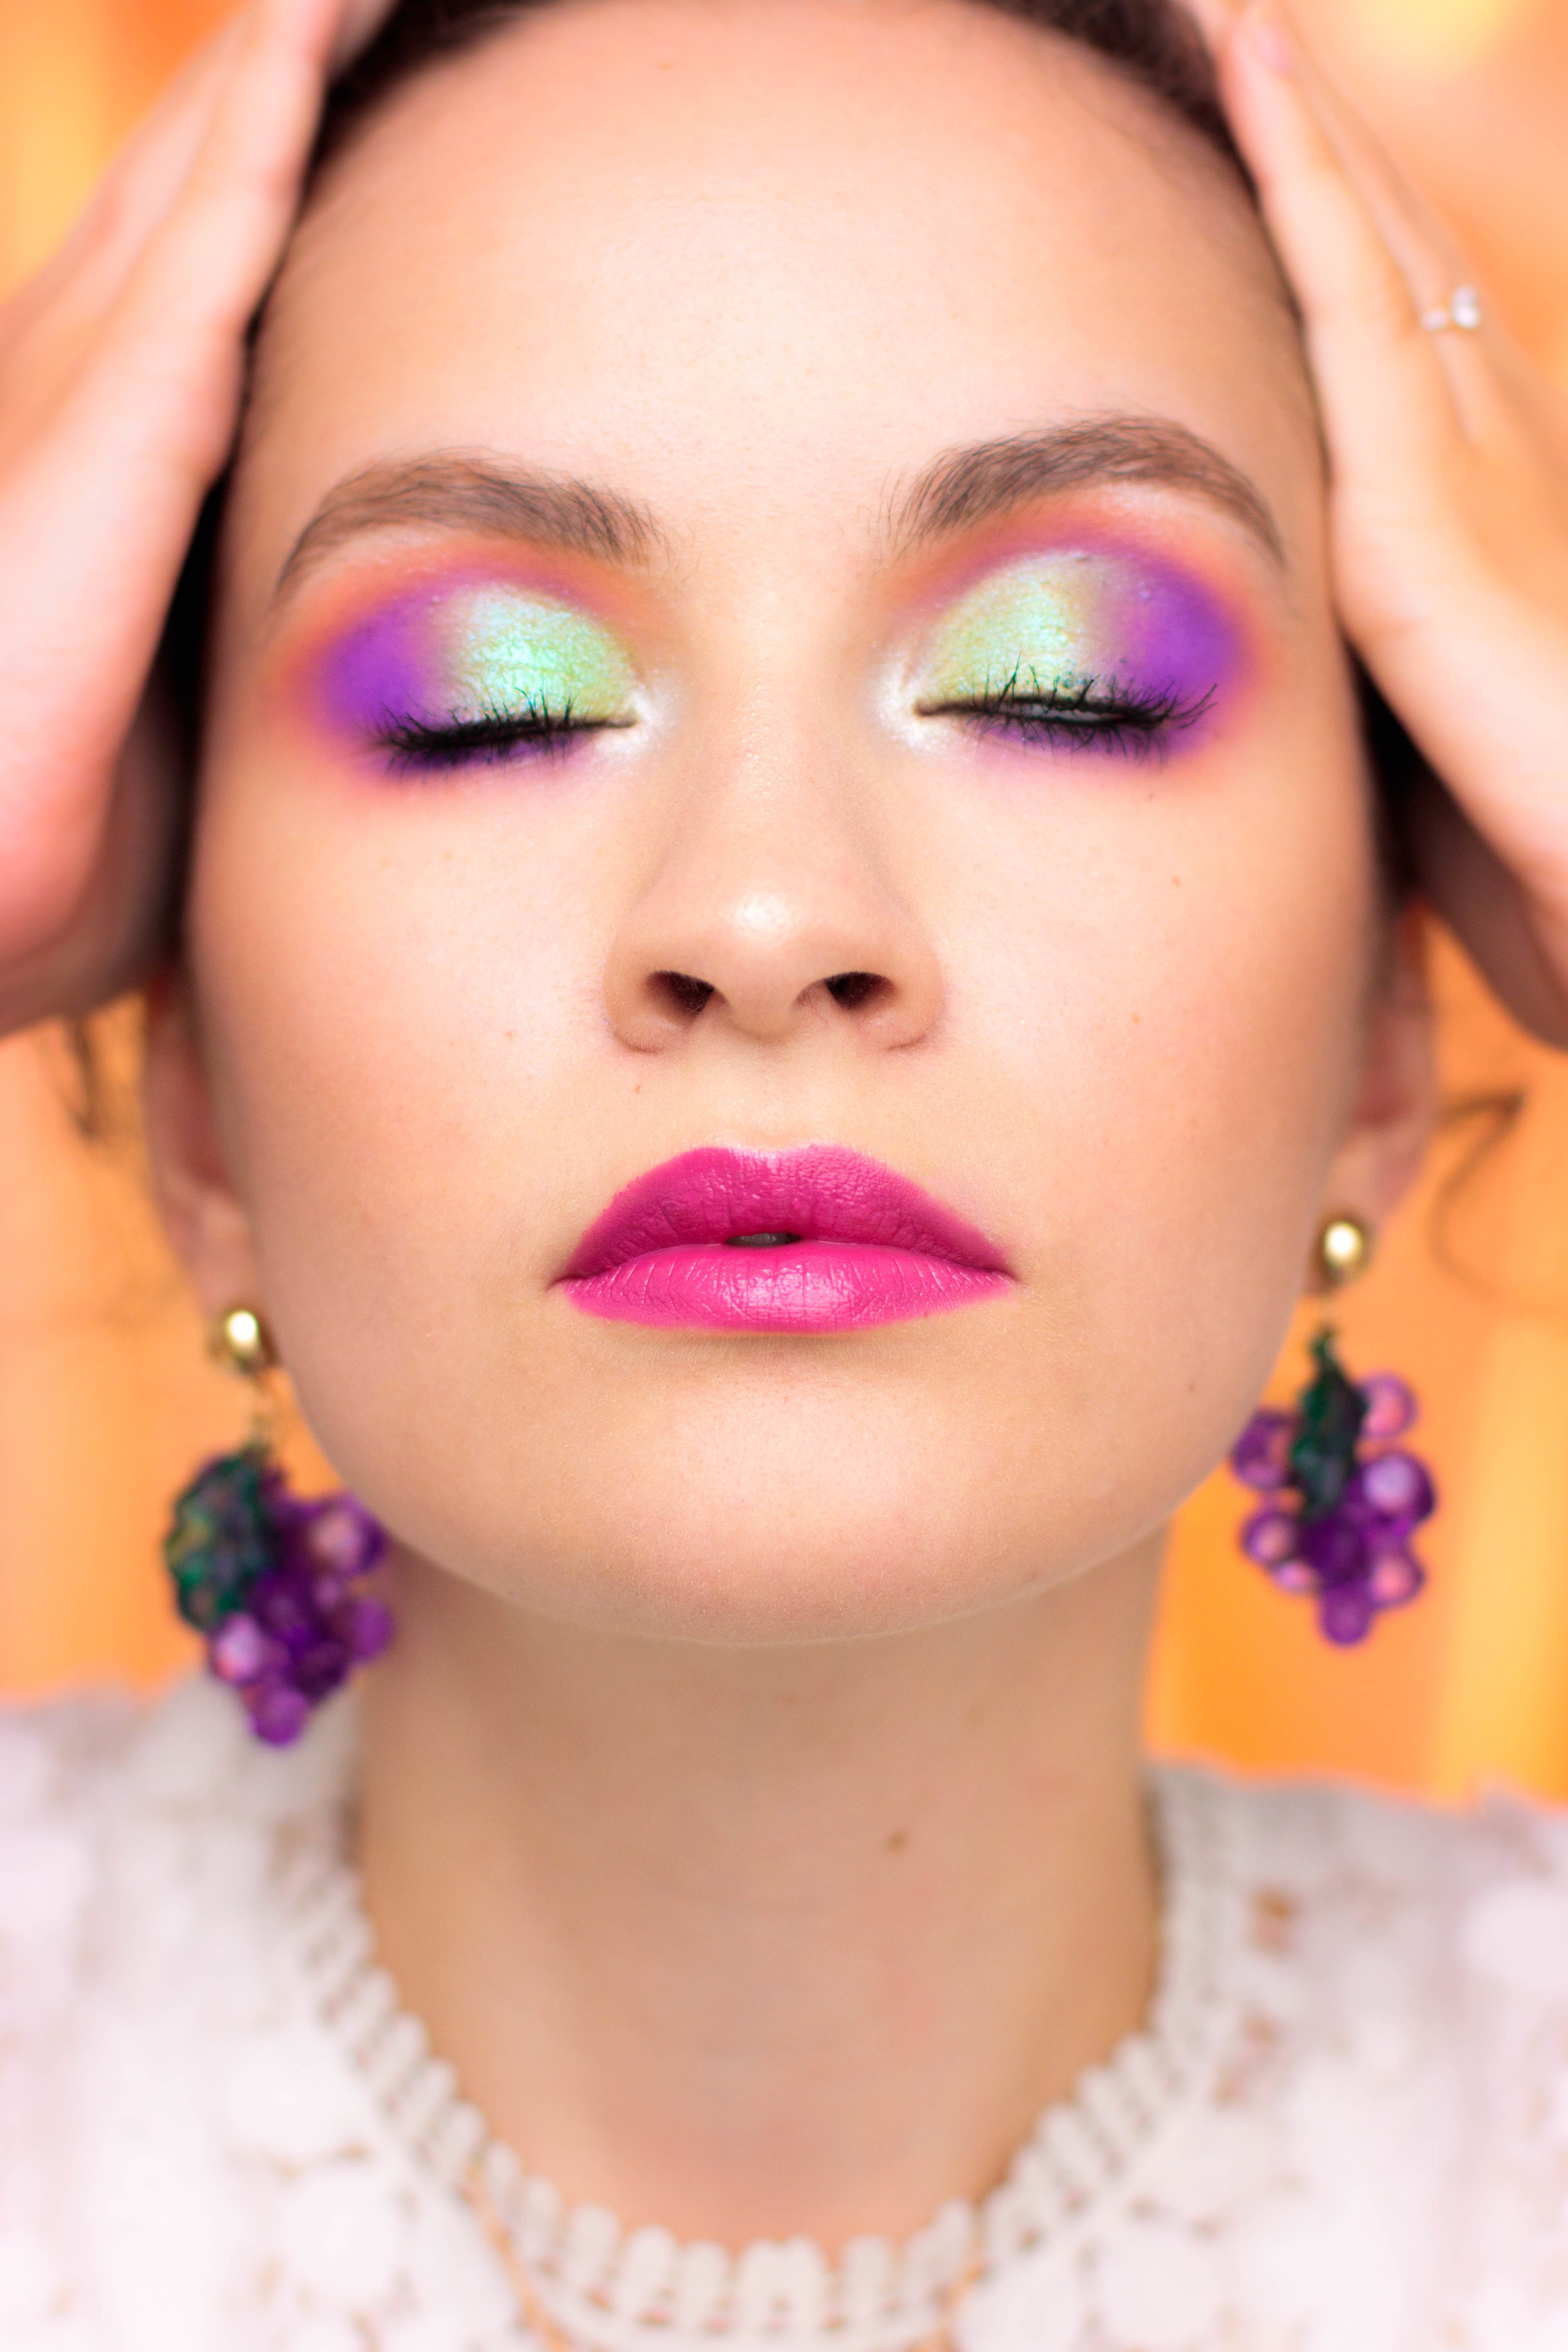 makeup-pauuulette-eyn-bright-matte-beauty-bay-makeup-revolution-chocolate-lime-4.jpg